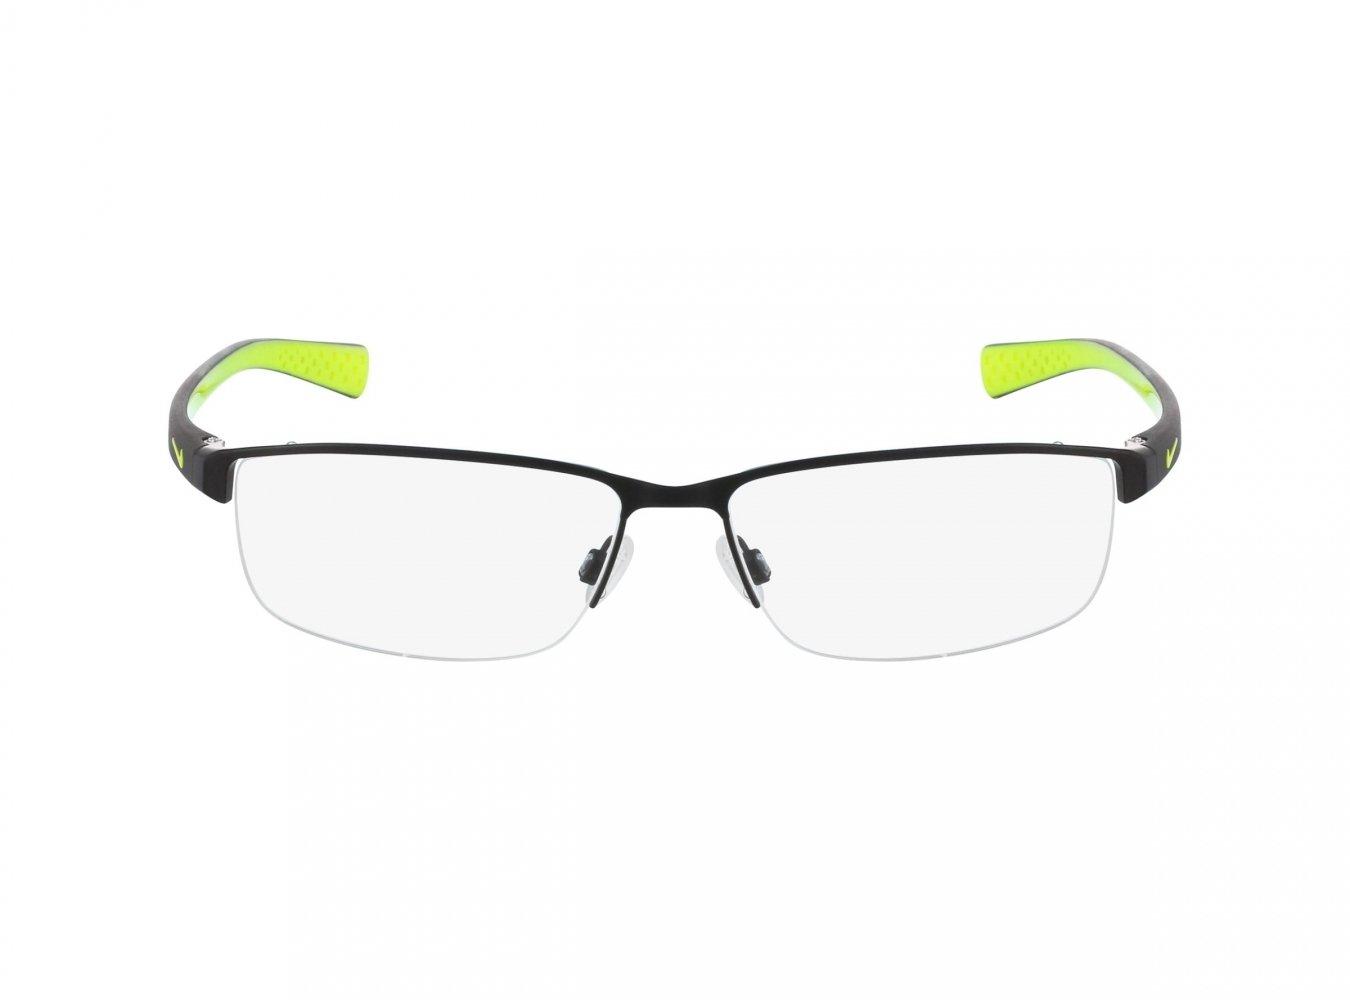 Eyeglasses NIKE 8098 015 SATIN BLACK-ANTHRACITE